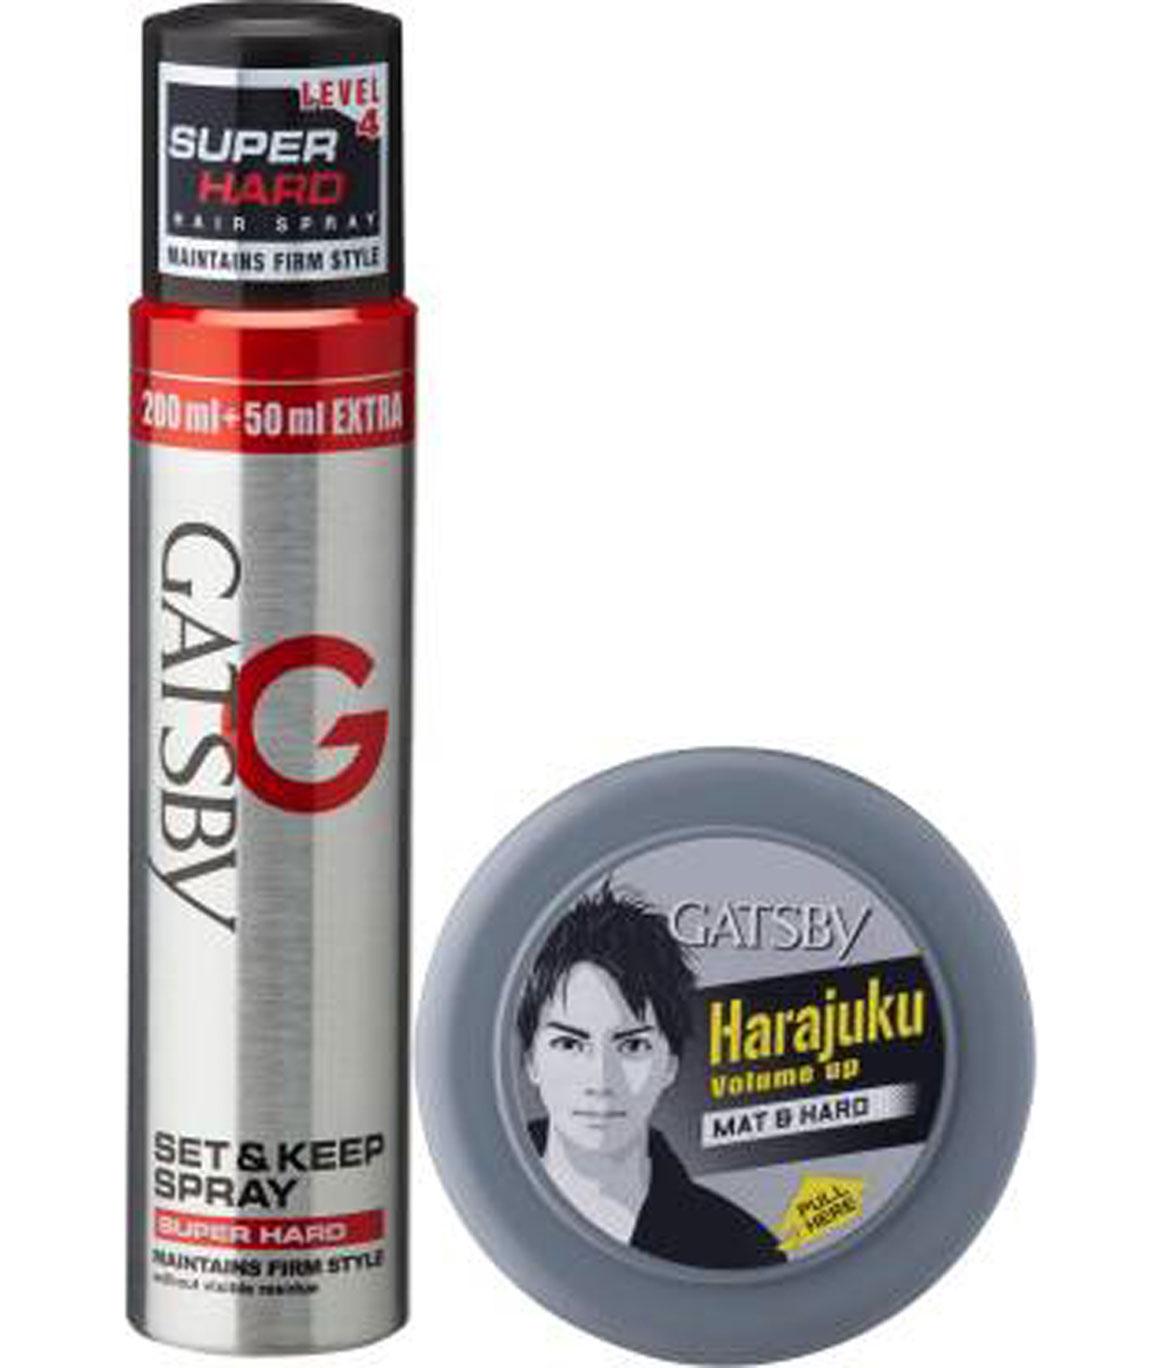 GATSBY SET & KEEP HAIR SPRAY SUPER HARD 250 ML WITH HAIR STYLING WAX MAT & HARD 75 Gm SPRAY (325 G)